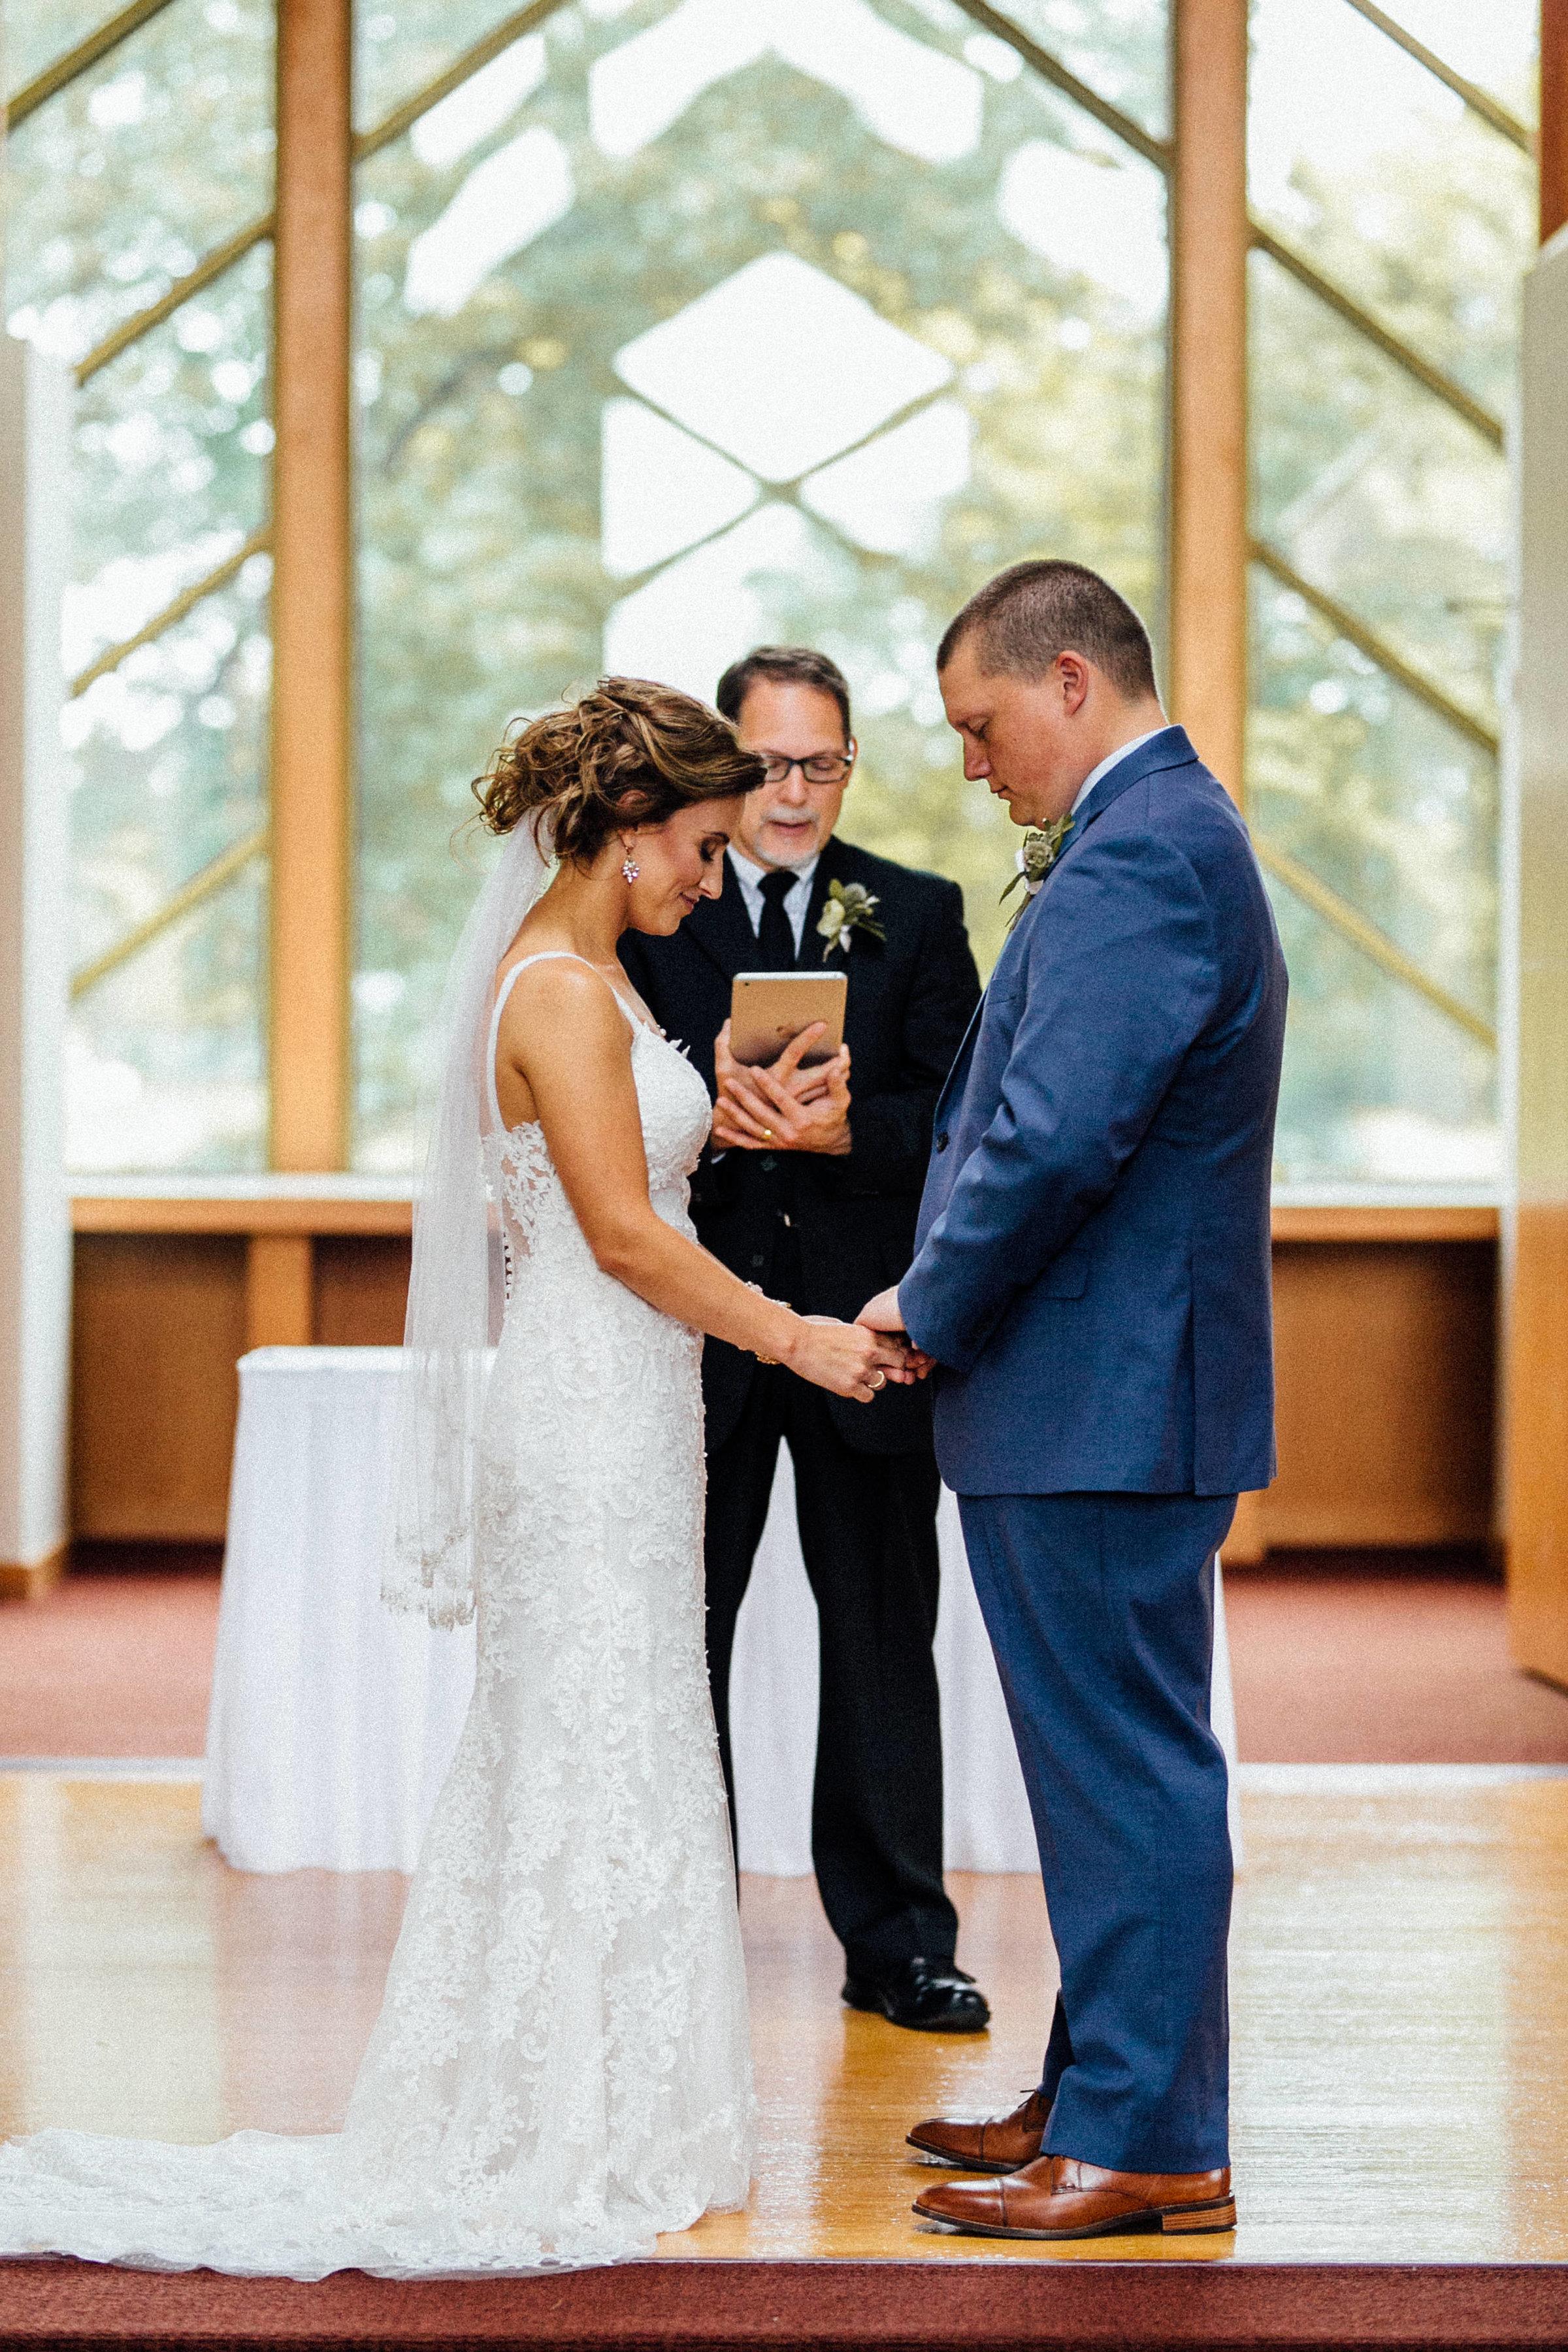 Whitney-Kevin-Ceremony-Michigan-Wedding-Photographer-69.jpg